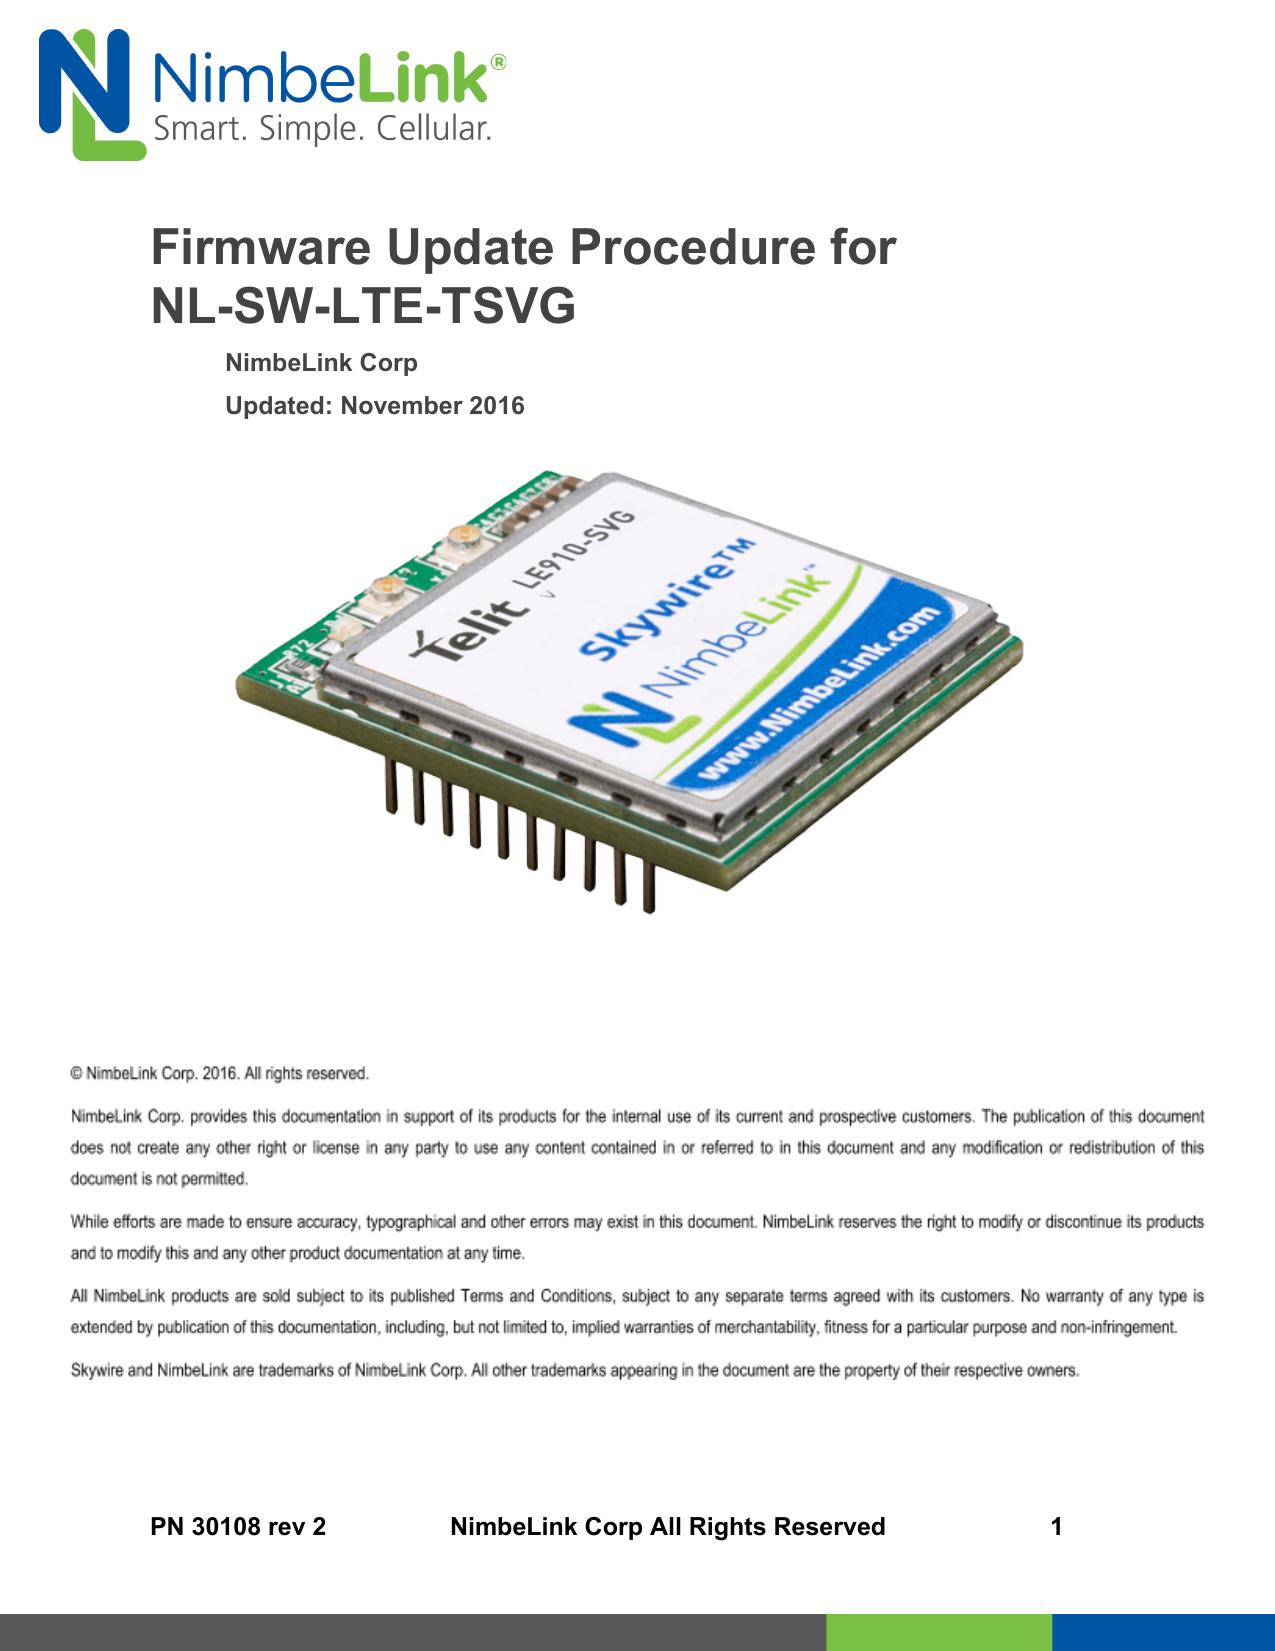 Firmware Update Procedure for NL-SW-LTE-TSVG | manualzz com